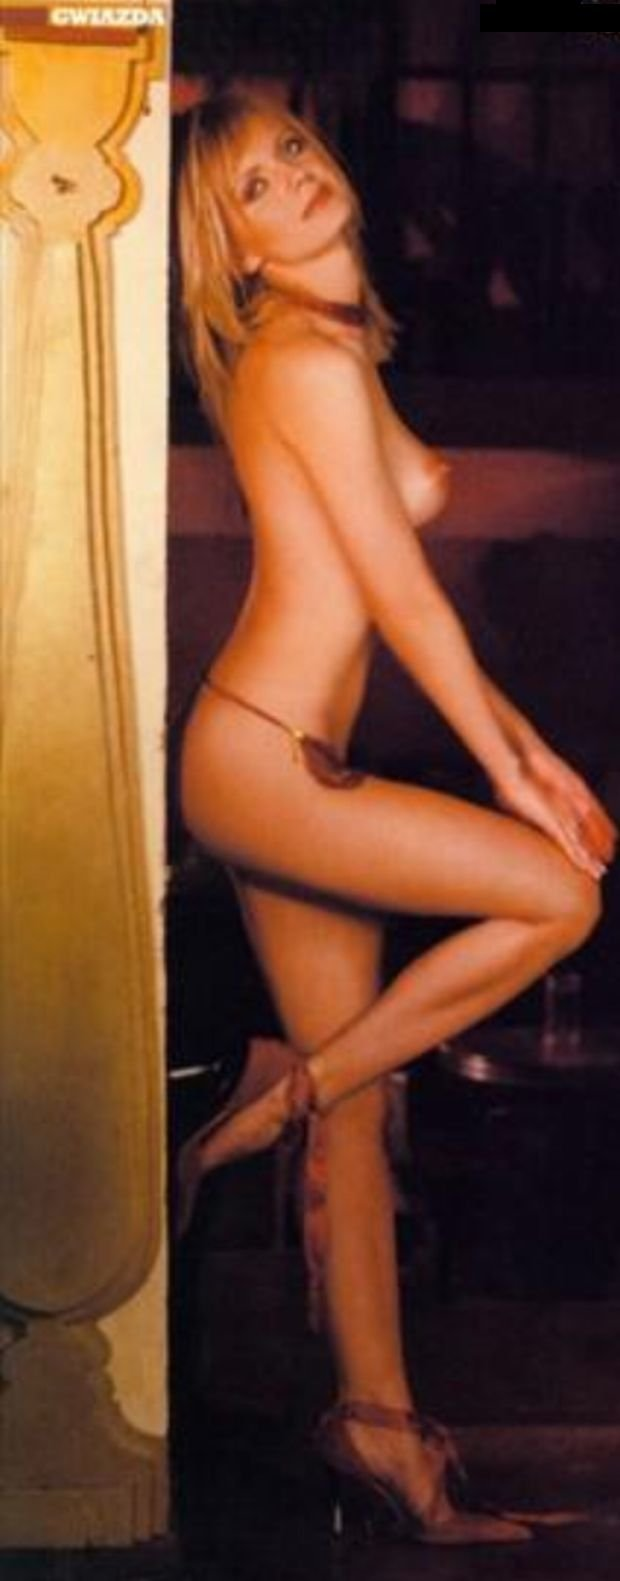 Olga Borys, Playboy, luty 2004.